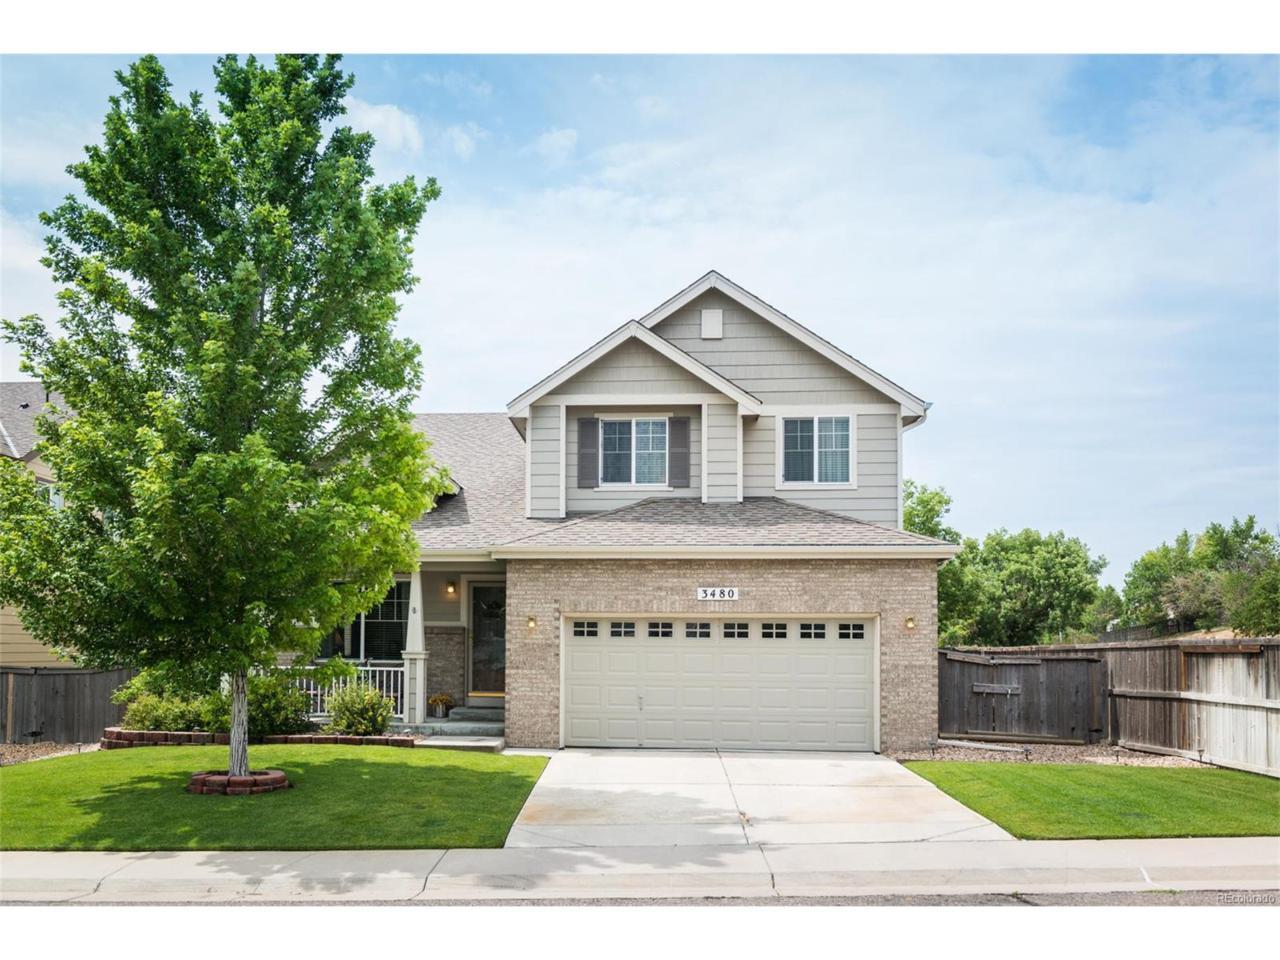 3480 E 100th Court, Thornton, CO 80229 (MLS #4853100) :: 8z Real Estate